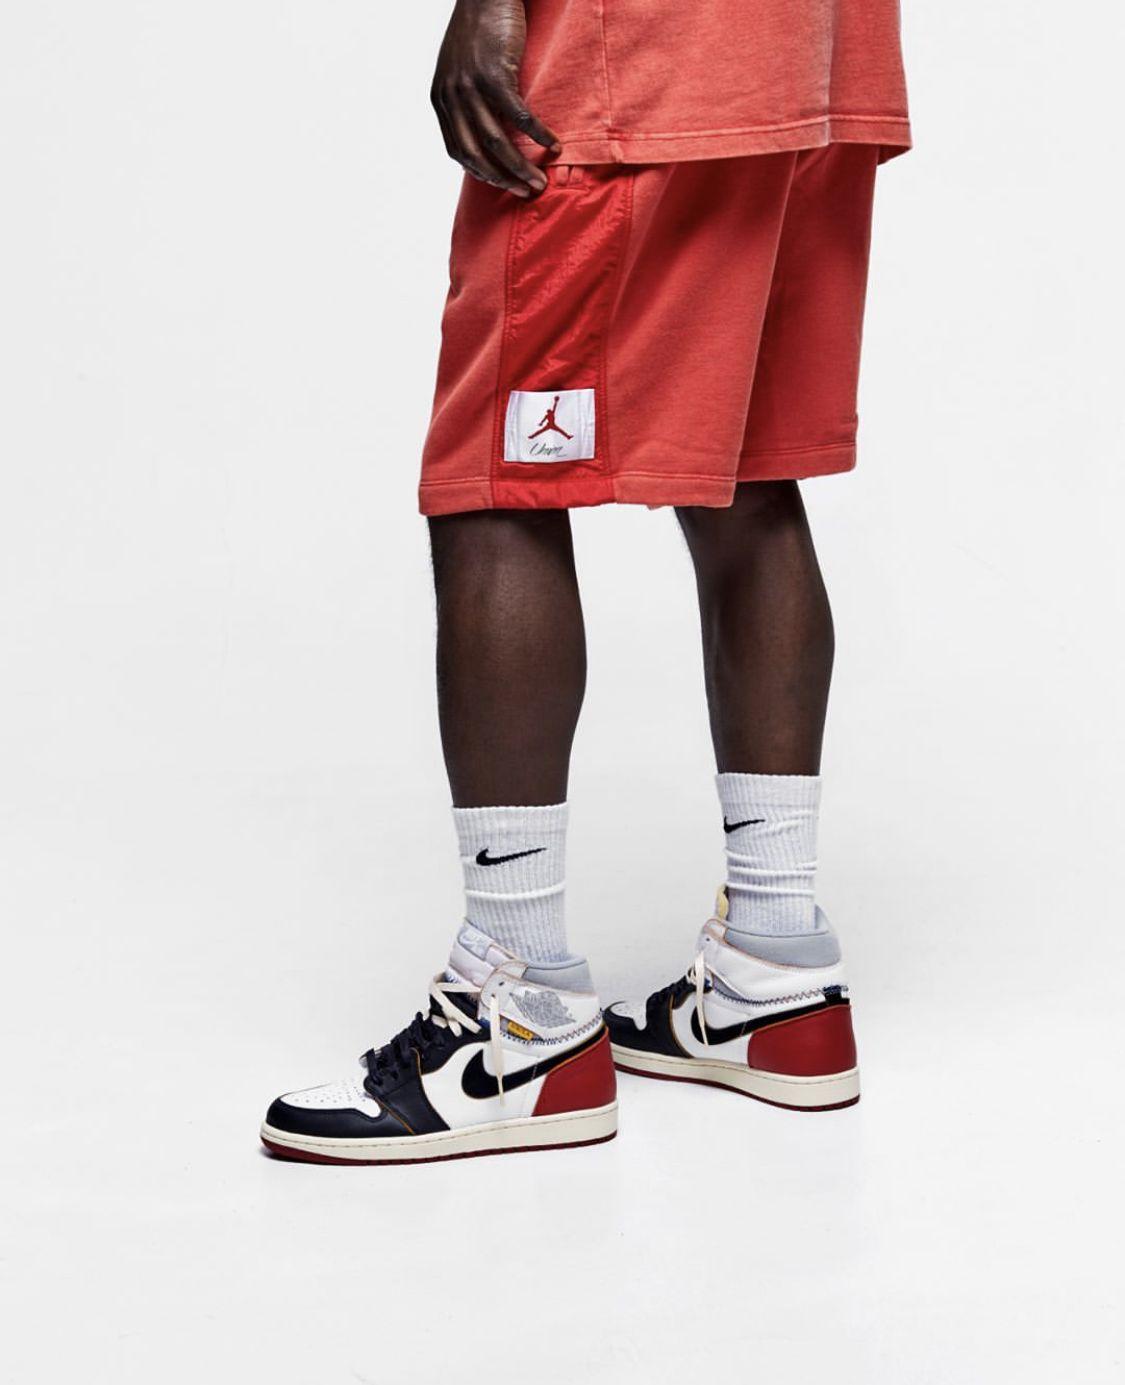 Pin By Matthew Scott On Kicks Love Air Jordans Jordans Jordan 1